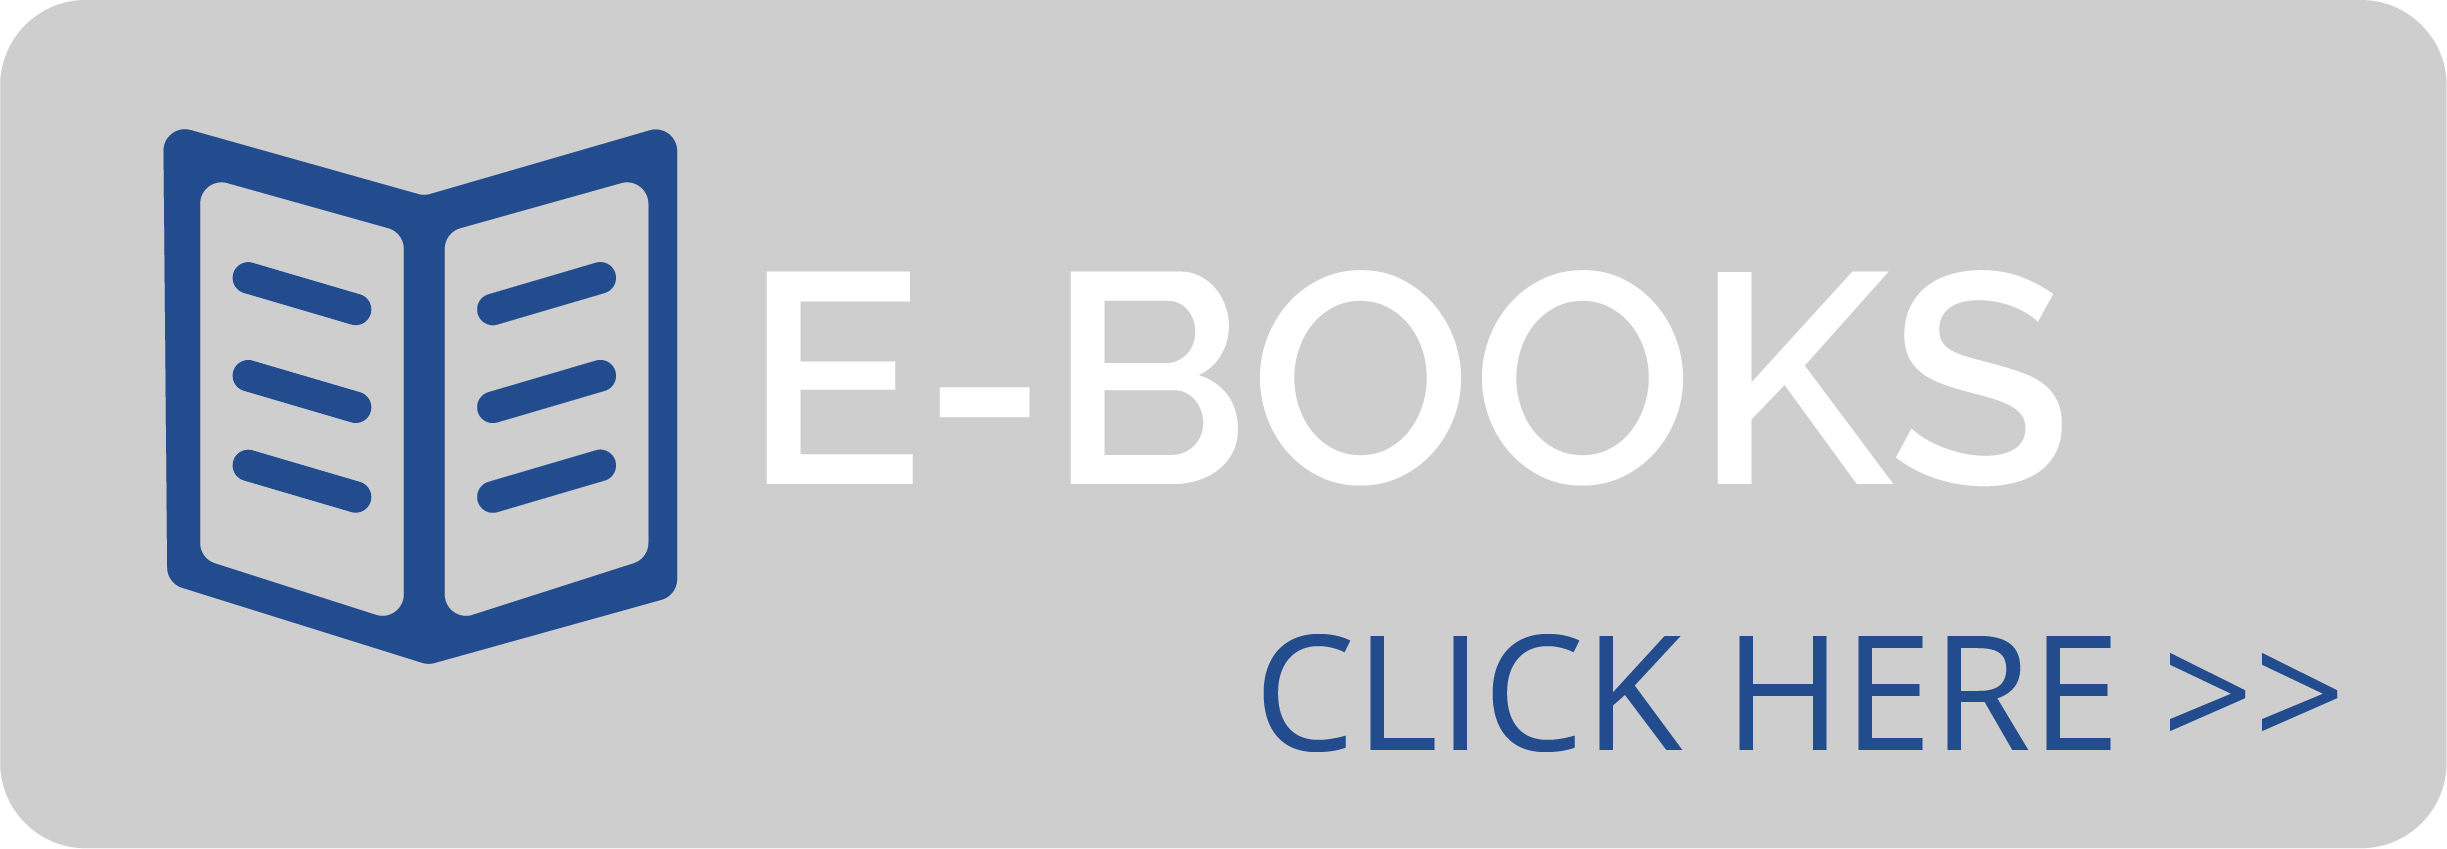 e-books-new.png